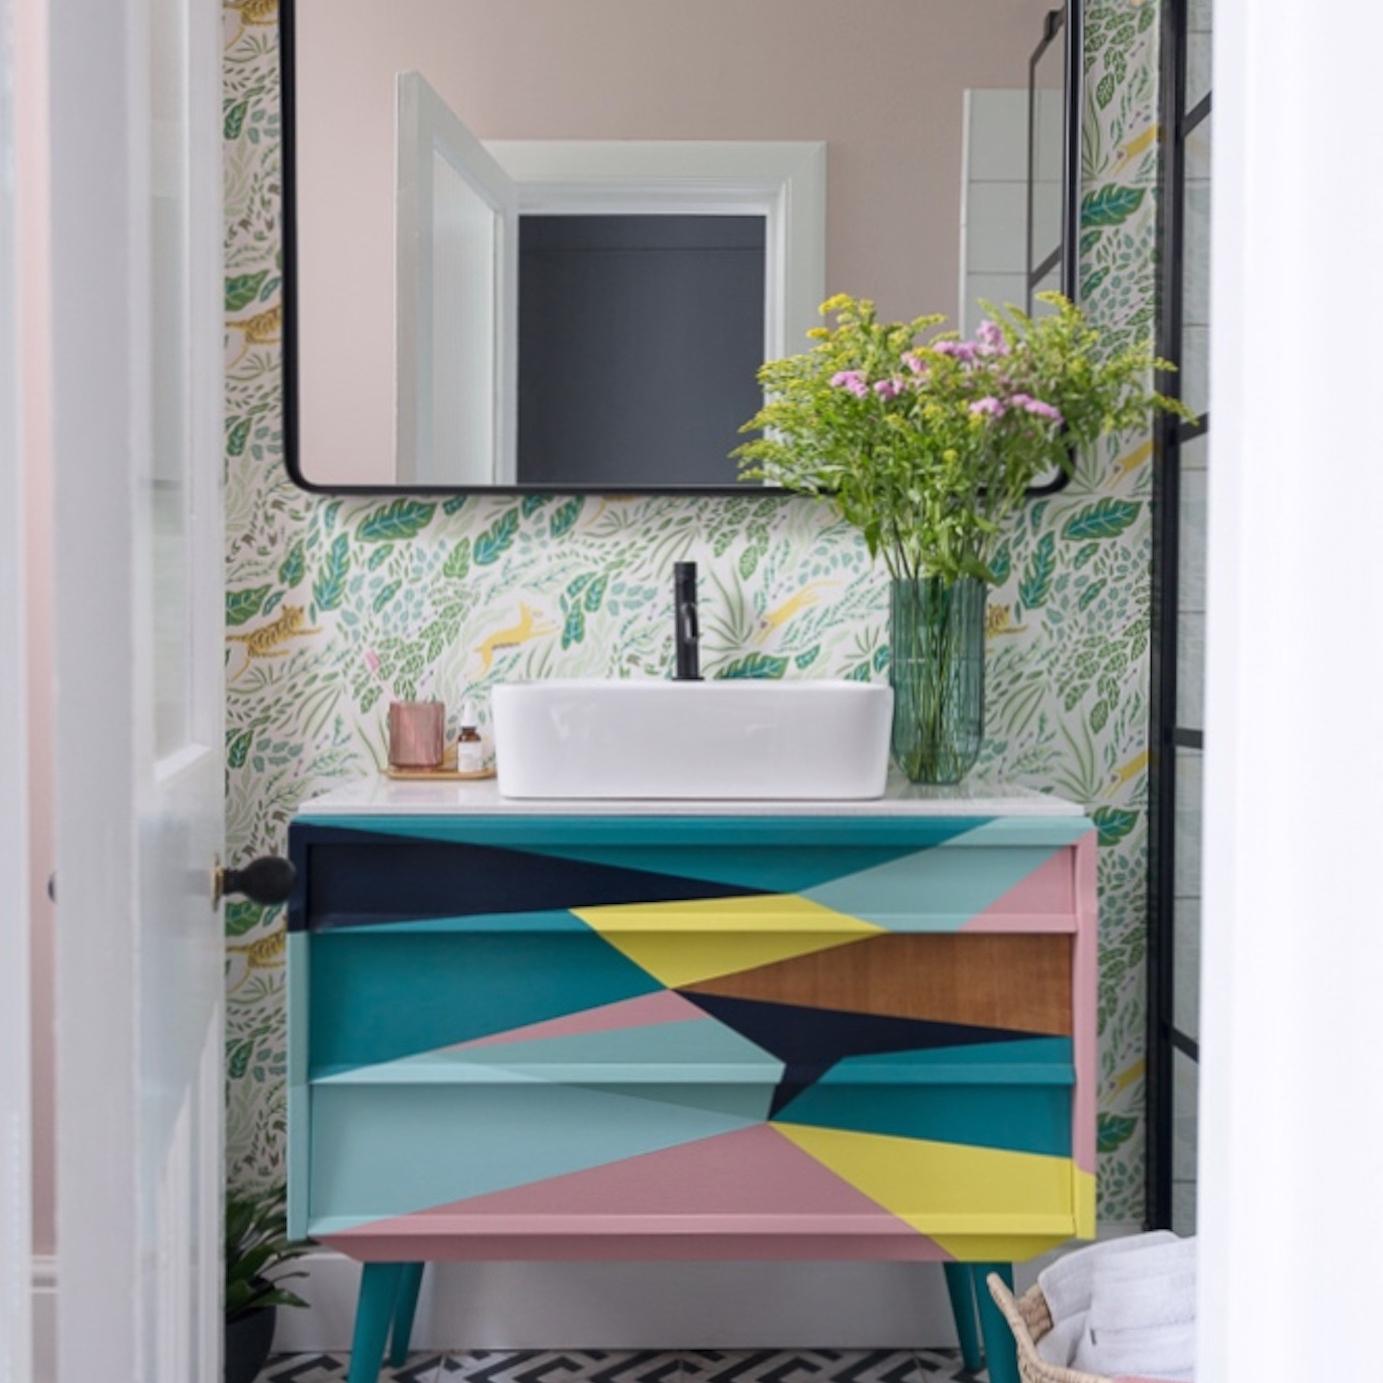 Liznylon_bathroom_upcycled_colourful_midcentury_vanity_with_wild_flowers